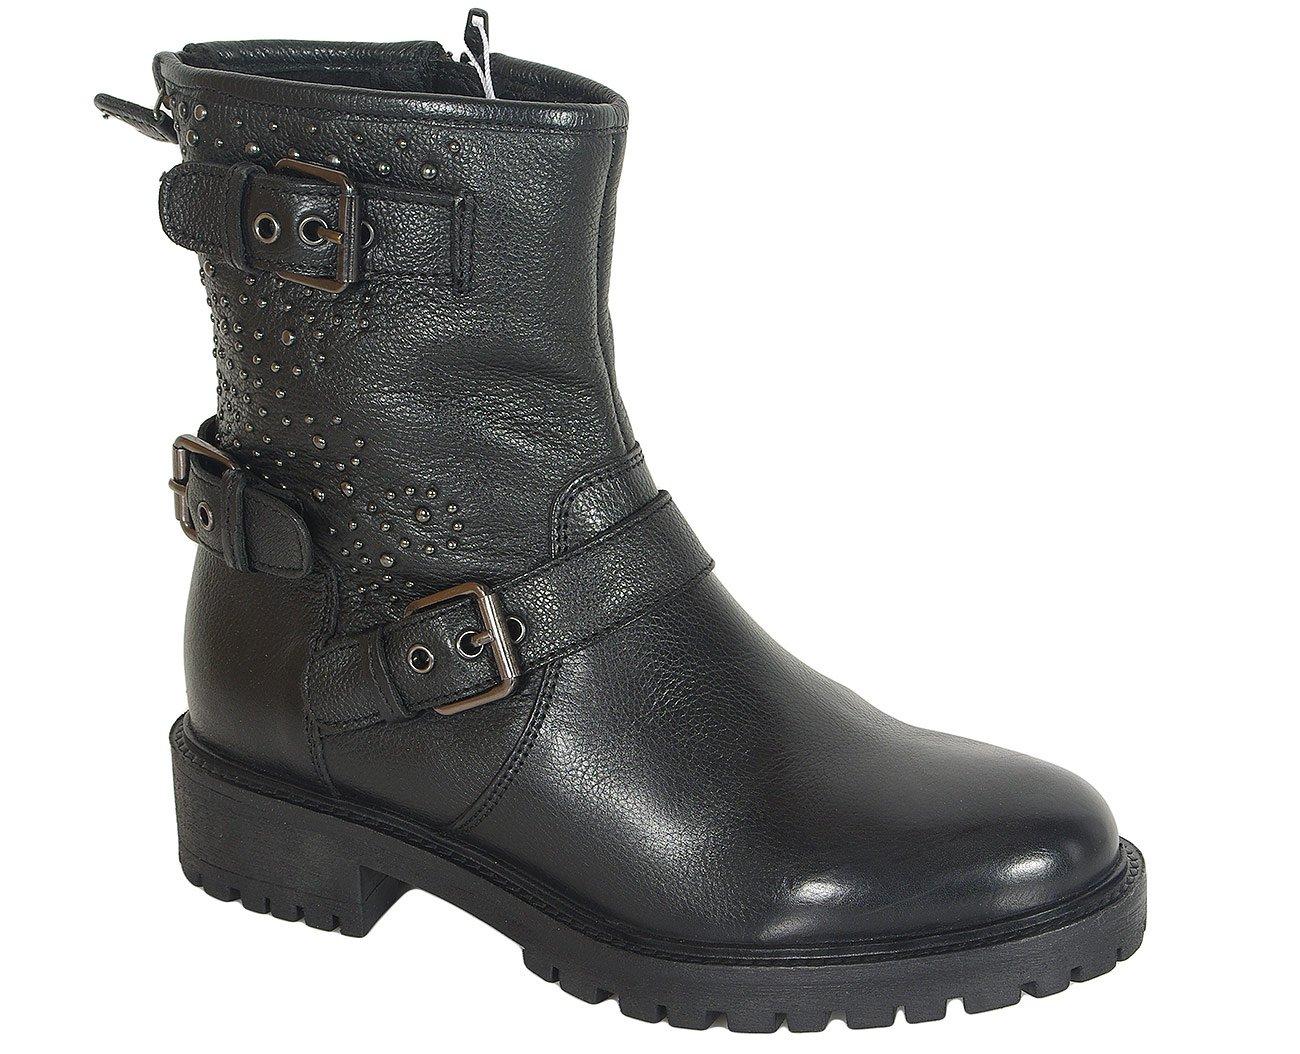 Geox Hoara H botki nappa black ankle boots